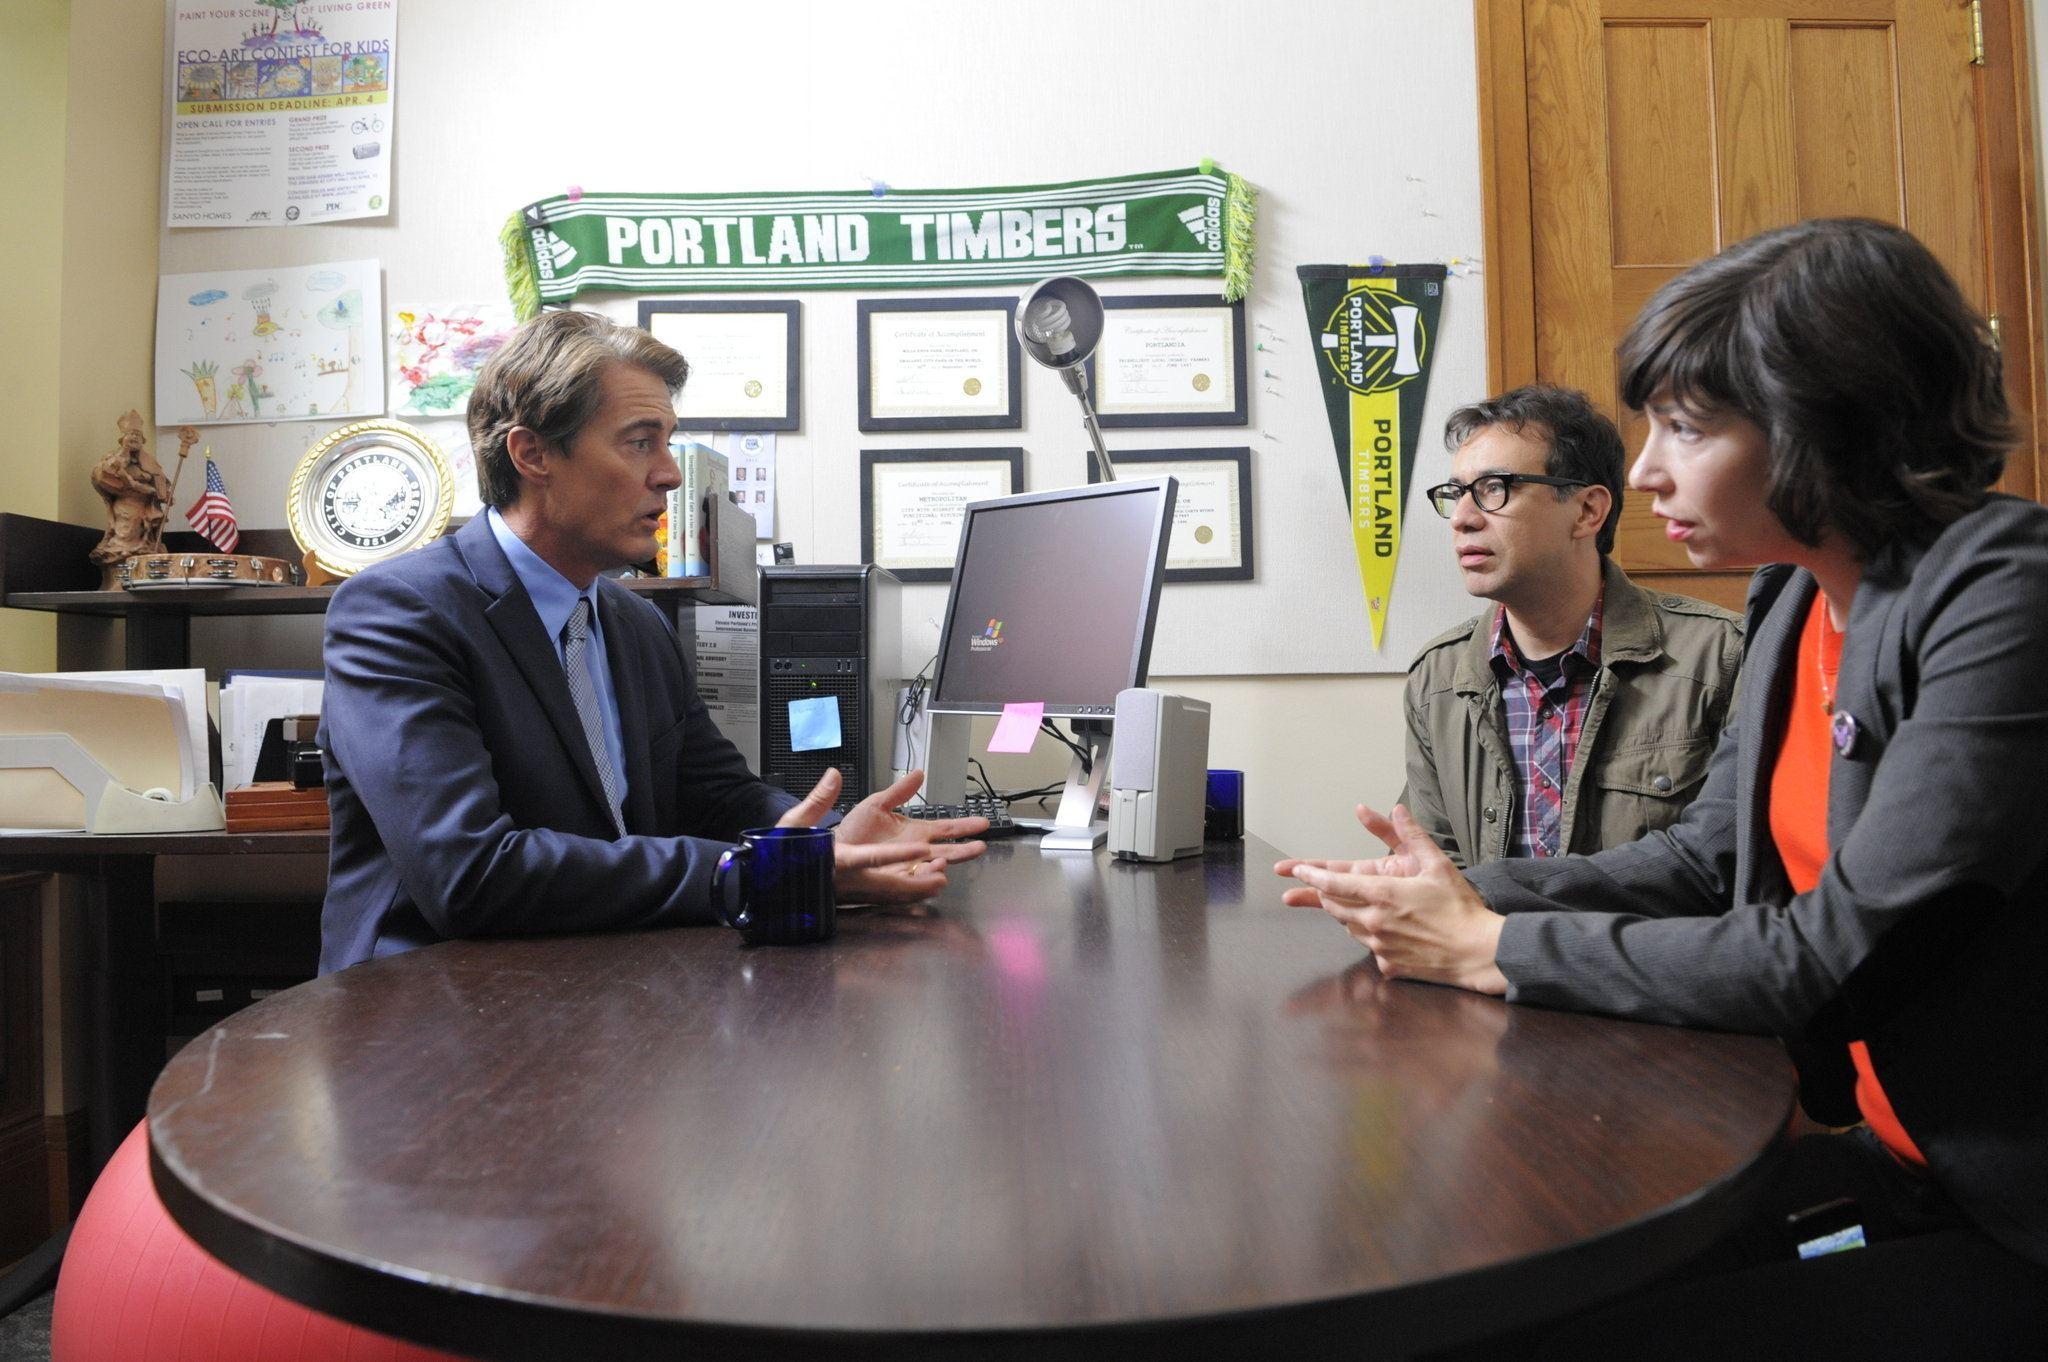 Two fictional Portland residents meet with their fictional mayor on 'Portlandia'